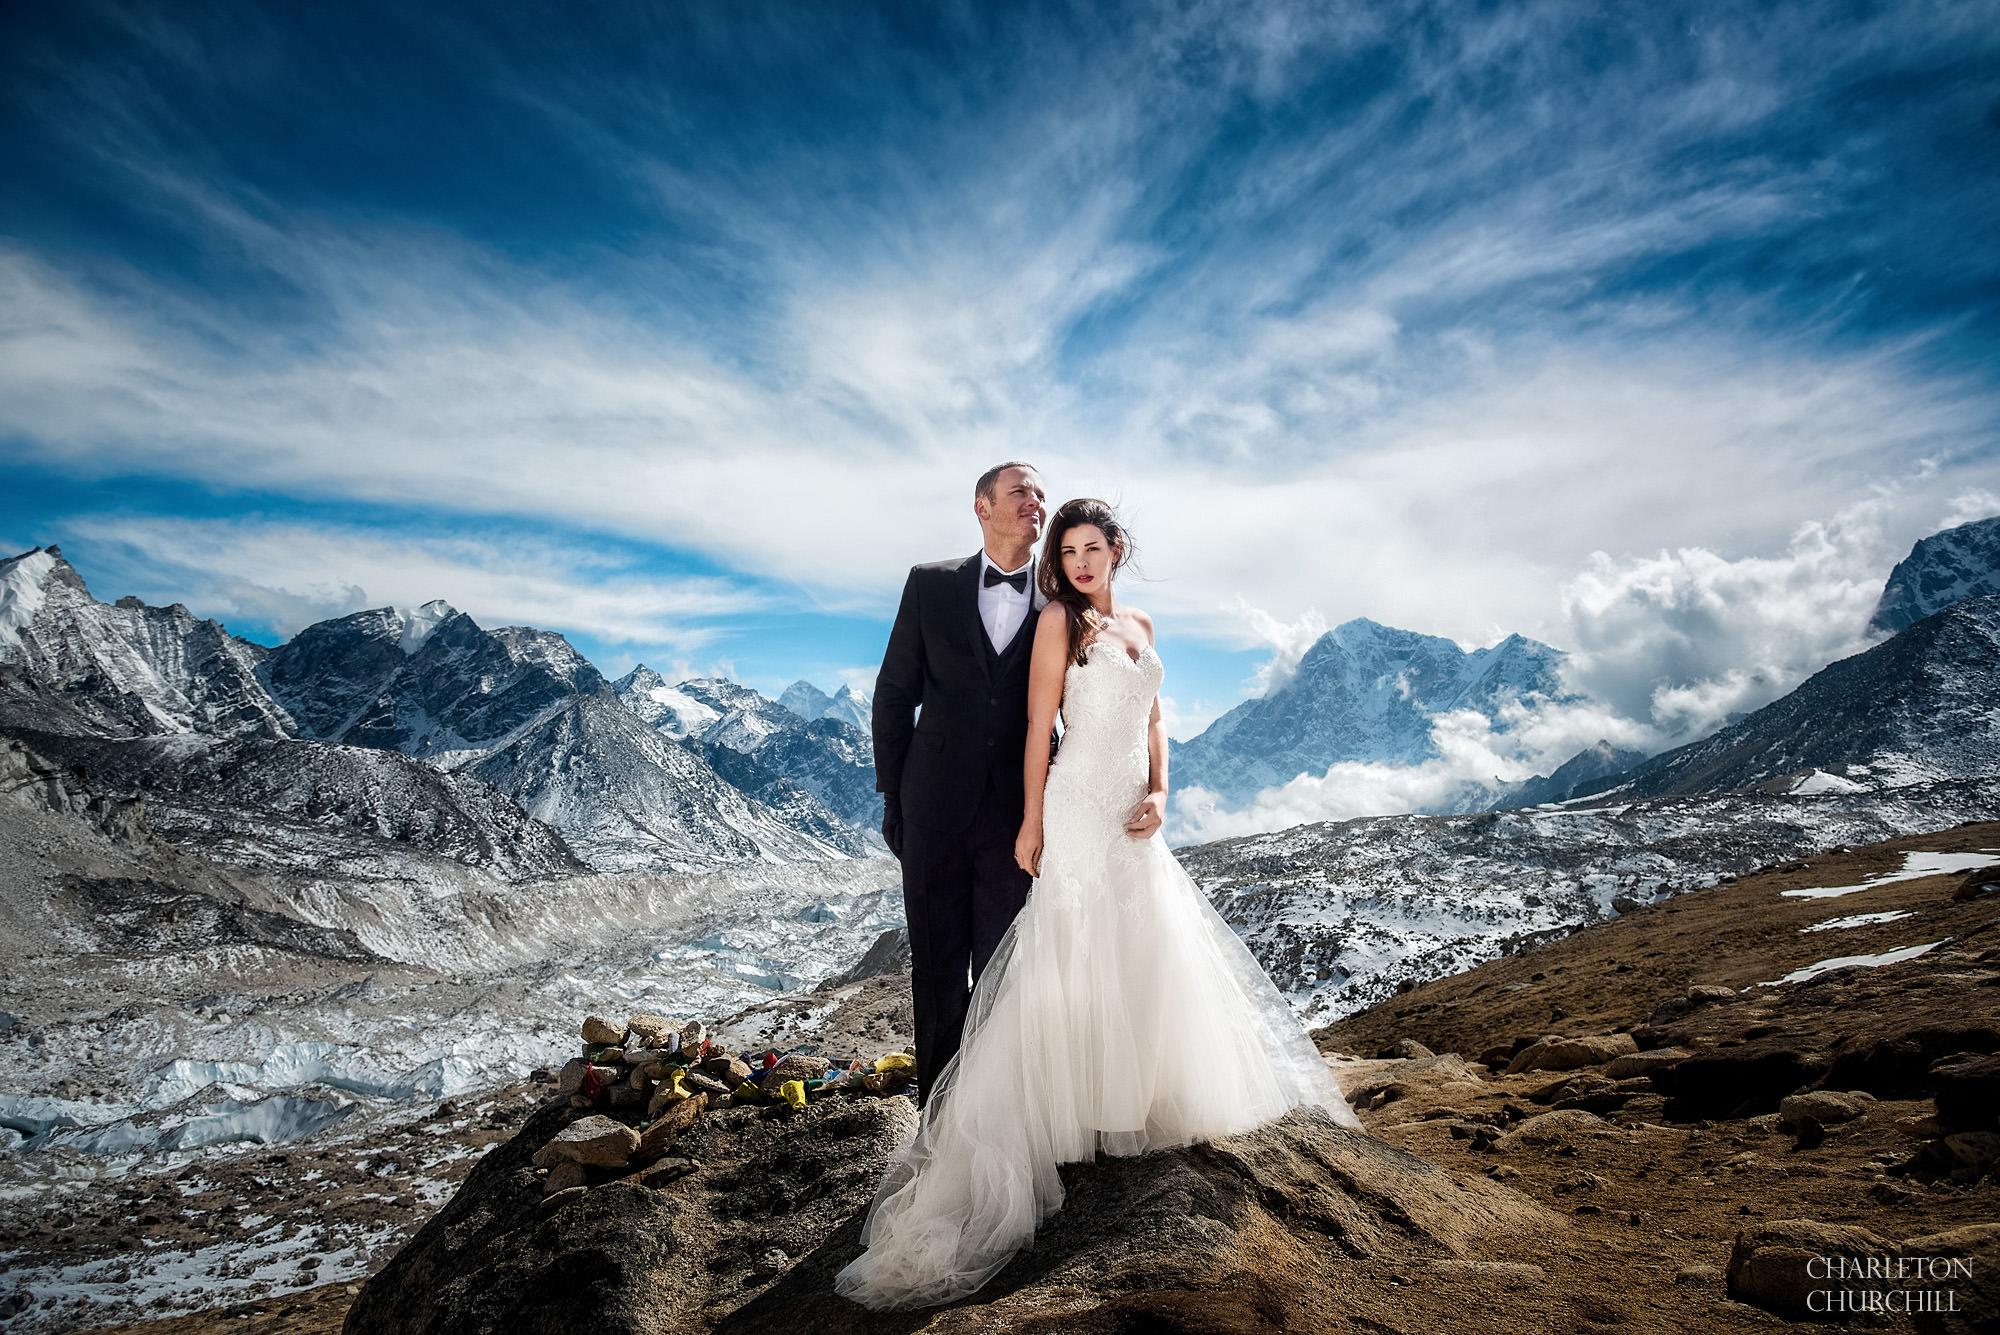 Dream-wedding-photoshoot-venuerific-blog-mt-everest